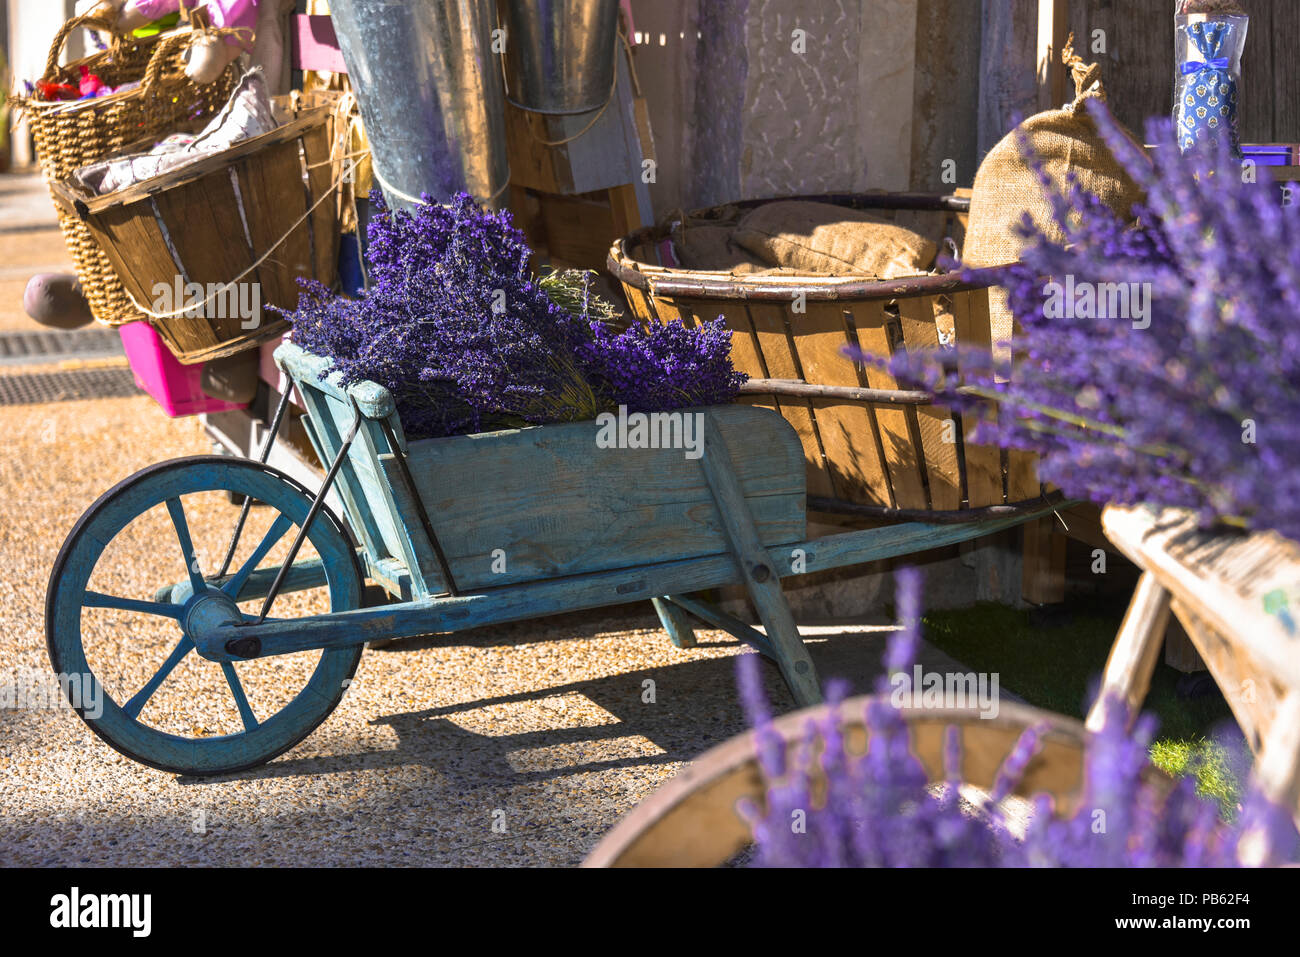 floristic decoration with lavender bushes, handcart in the village Sault, Provence, France, department Vaucluse, region Provence-Alpes-Côte d'Azur Stock Photo